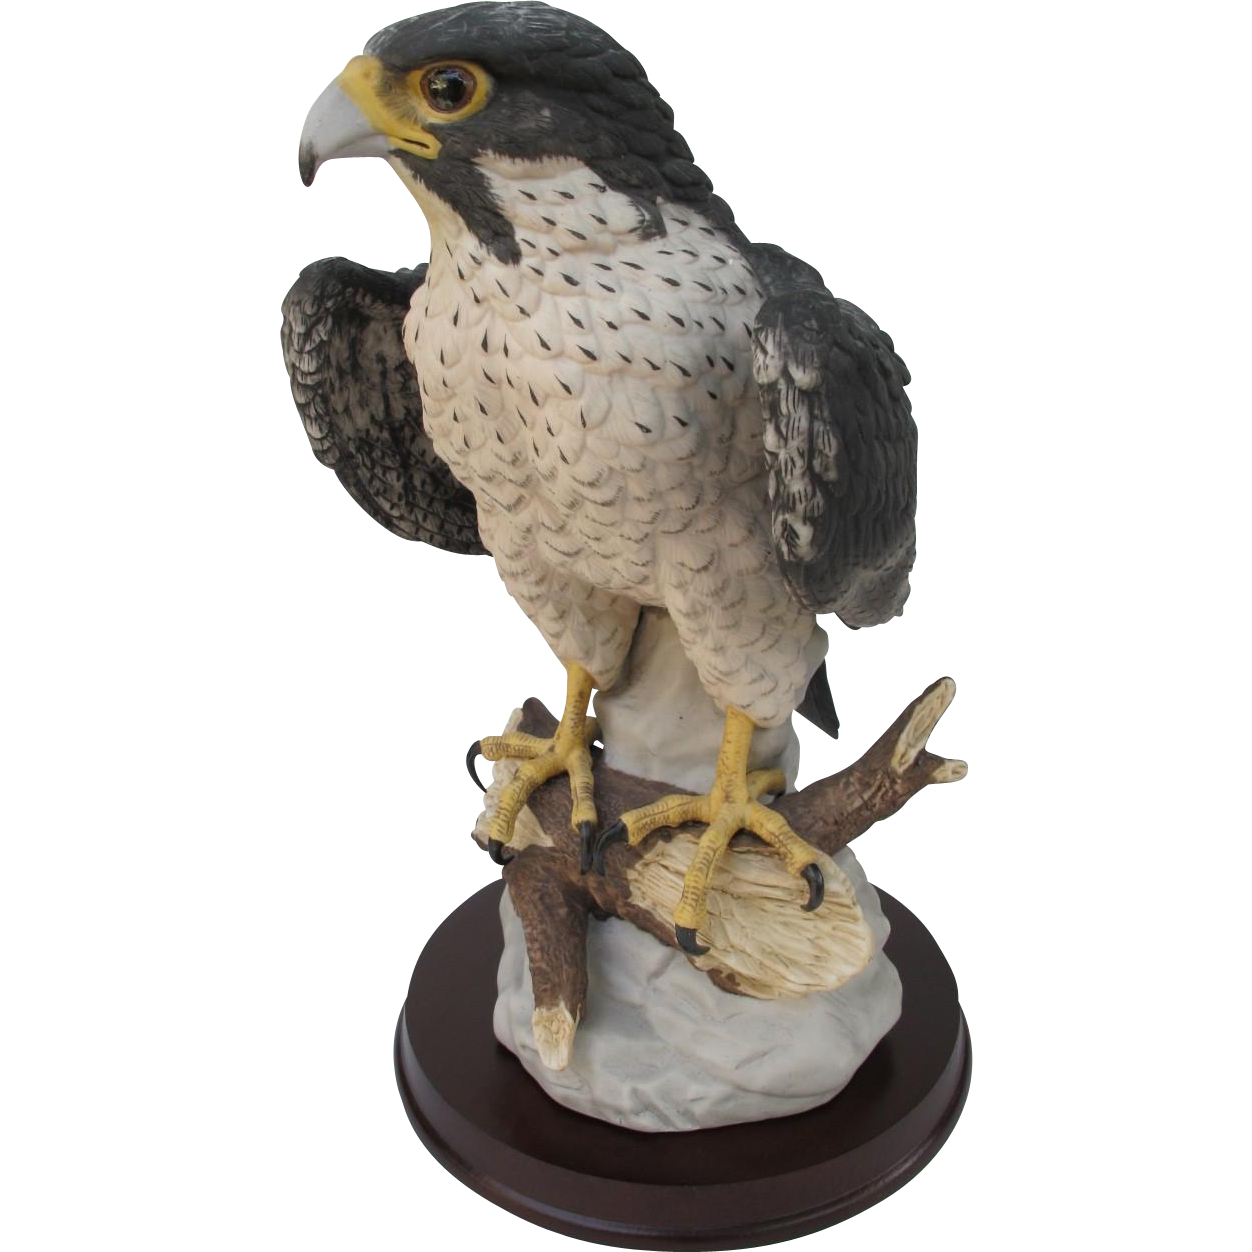 Vintage Stefani Peregrine Falcon Figurine Zales Large